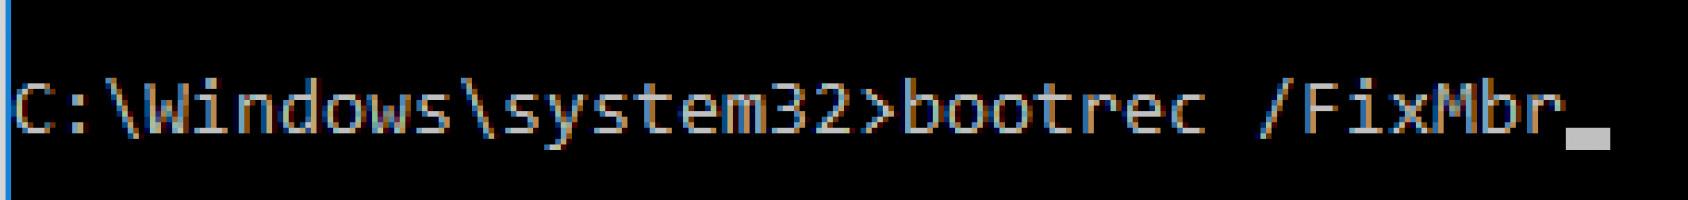 Use bootrec fix mbr command to fix machine_check_exception error